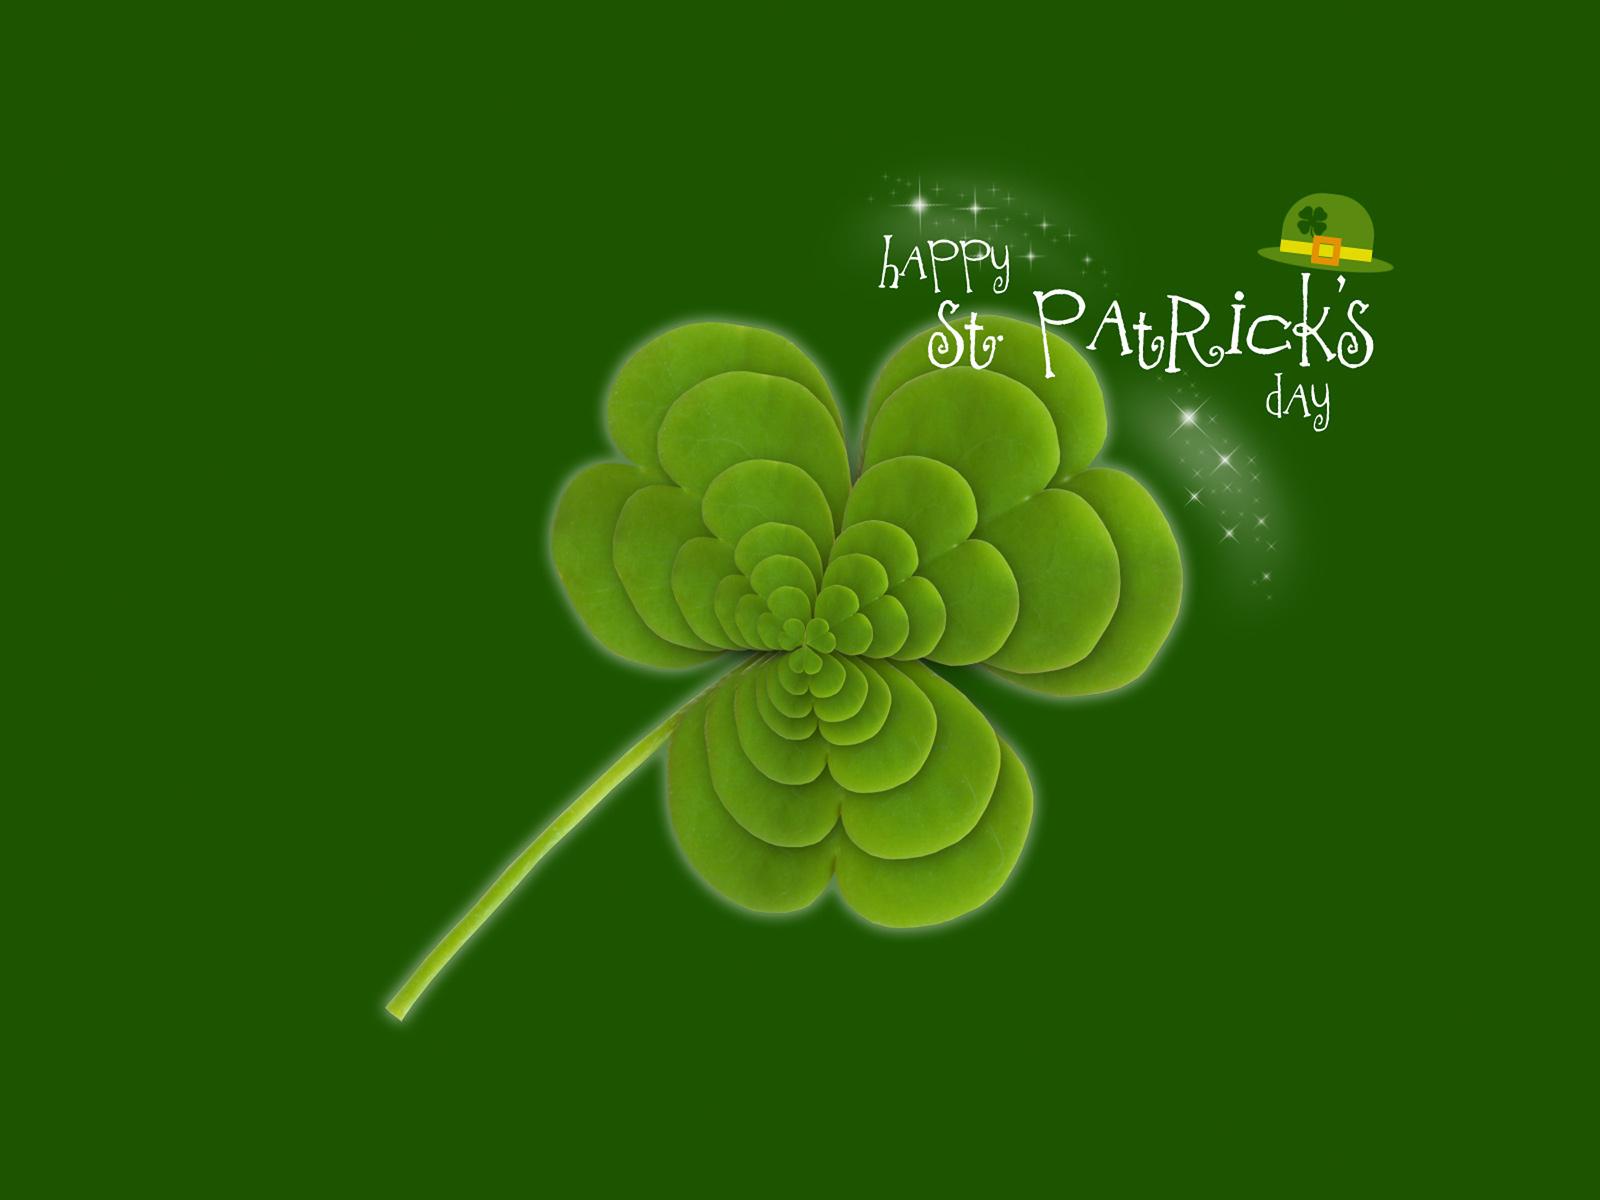 Holidays St Patrick s Day Happy Saint Patrick  015349 jpg 1600x1200